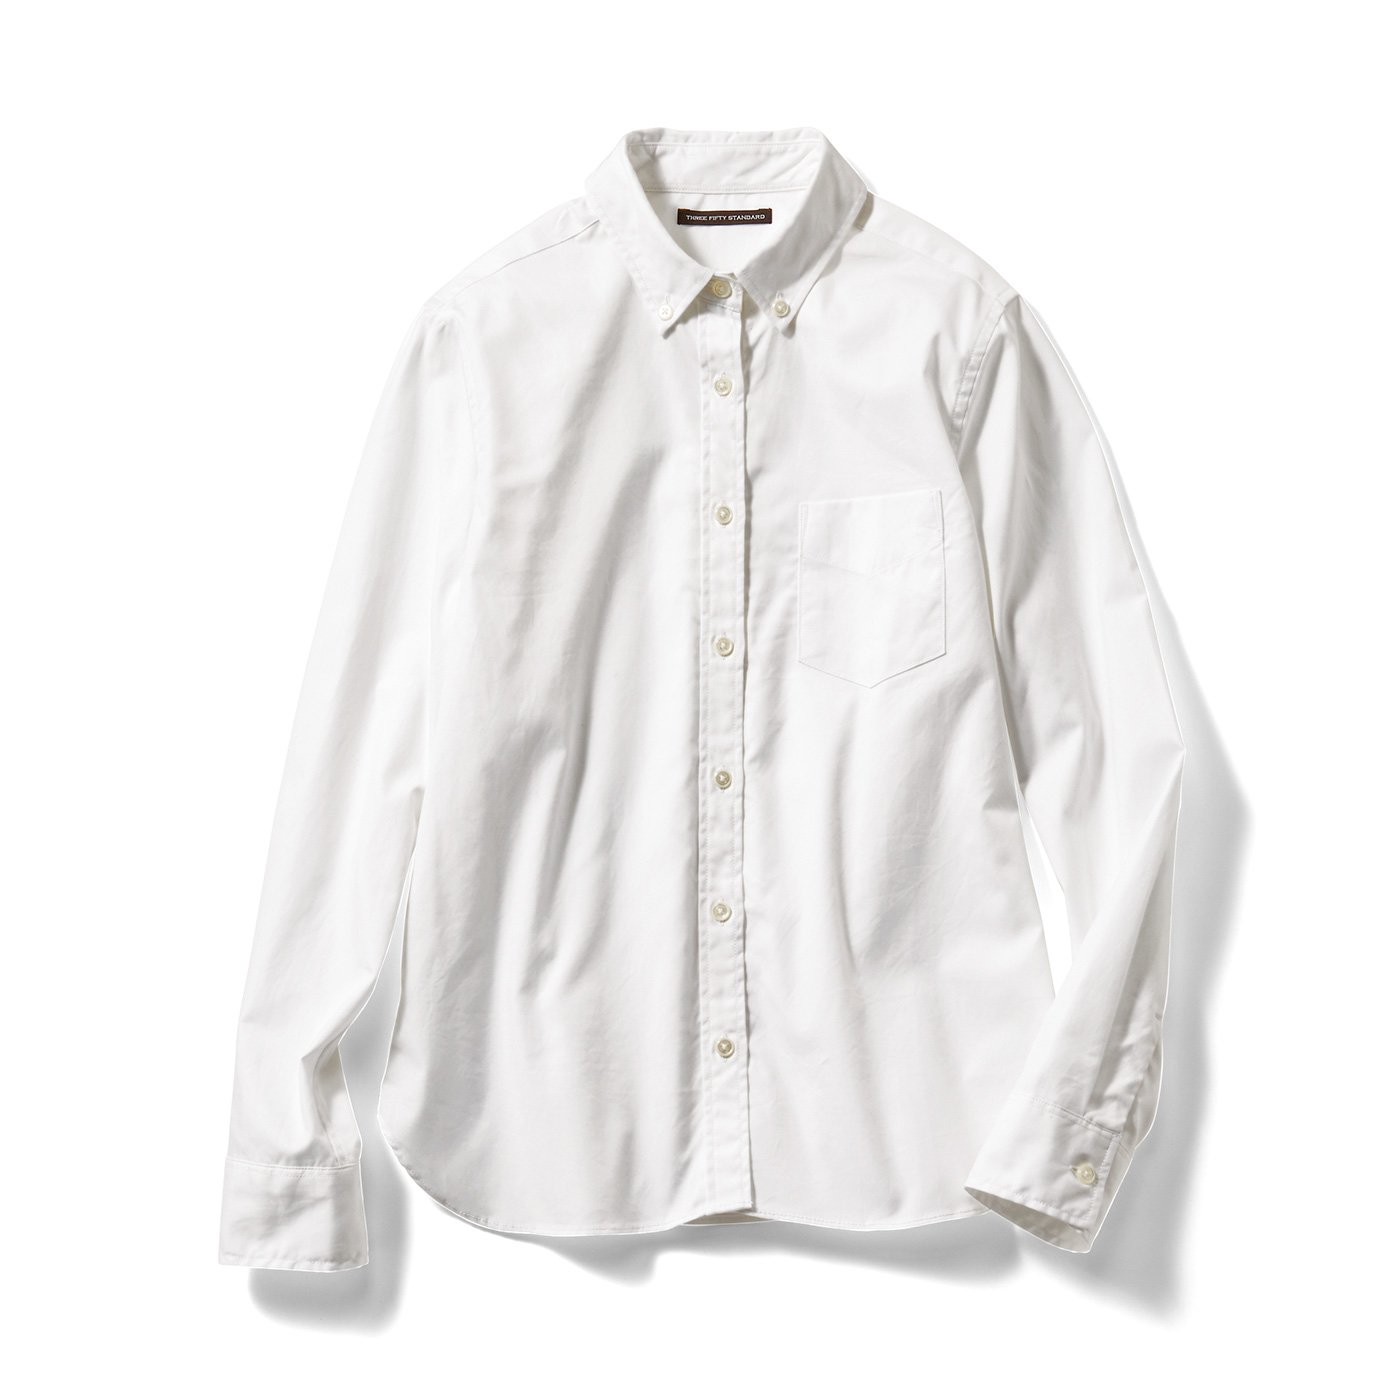 THREE FIFTY STANDARD 定番ボタンダウンシャツ〈ホワイト〉